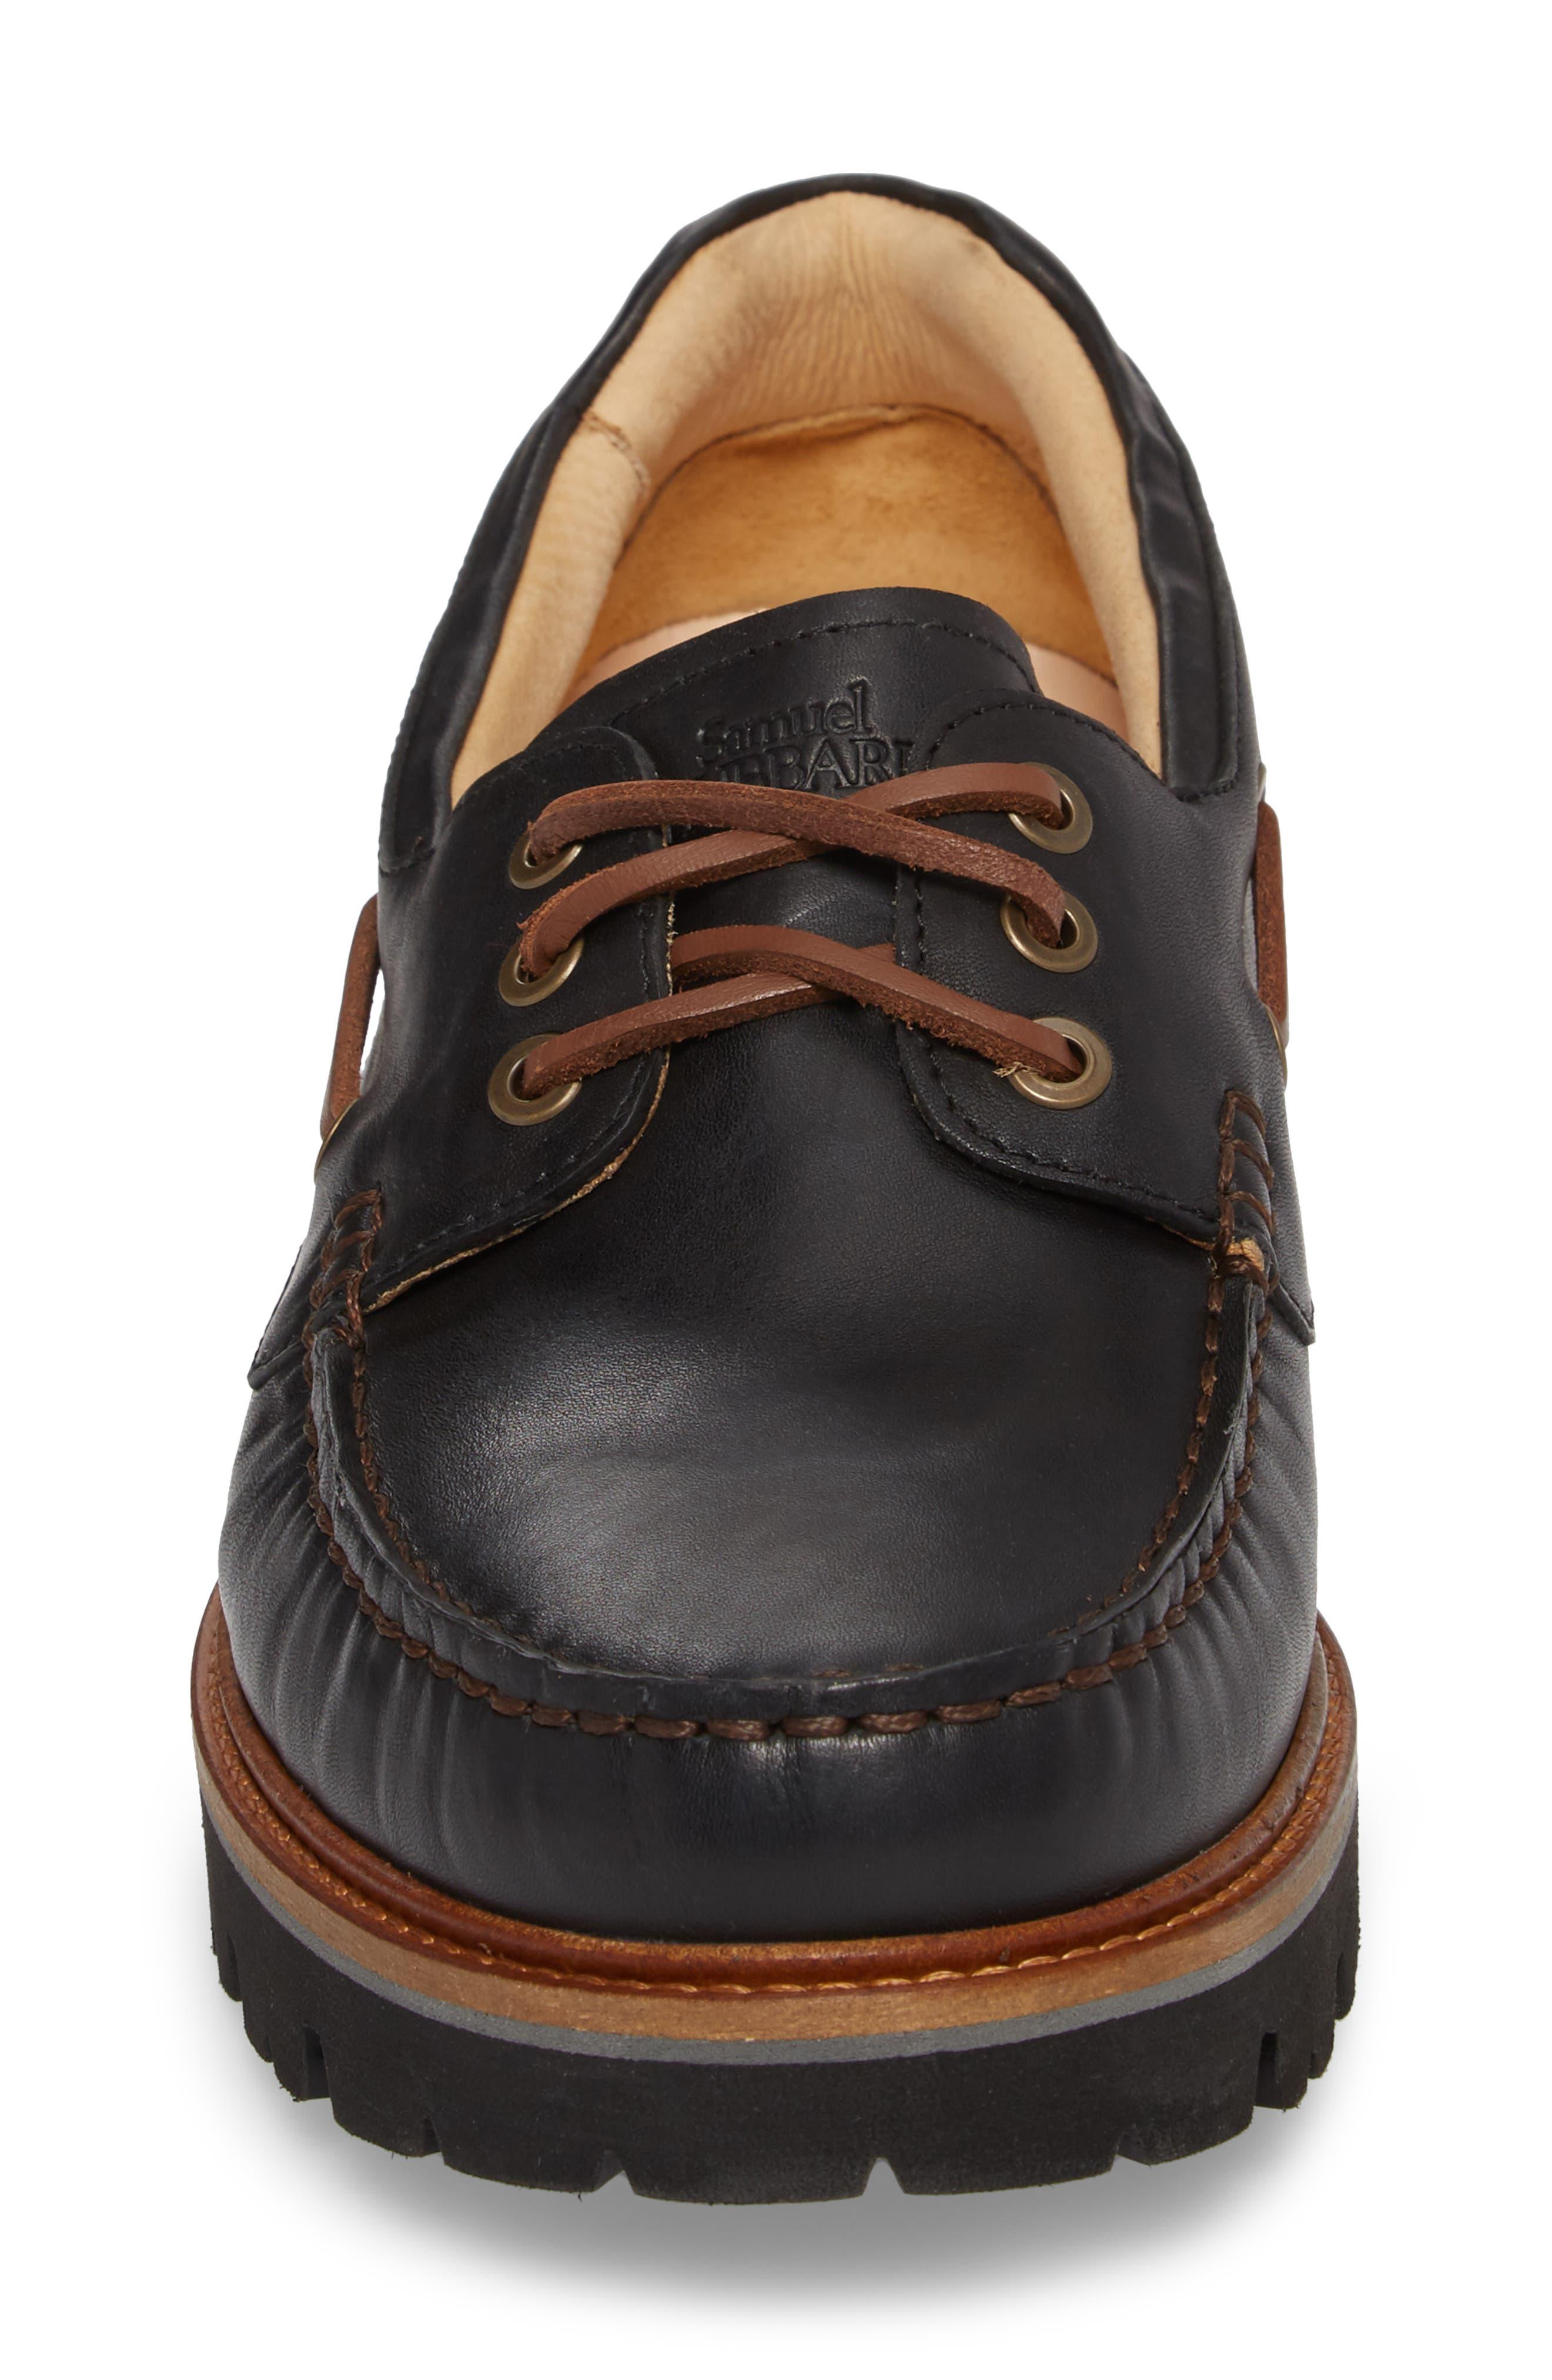 Camplight Water Resistant Boat Shoe,                             Alternate thumbnail 4, color,                             Saddlebag Black Leather